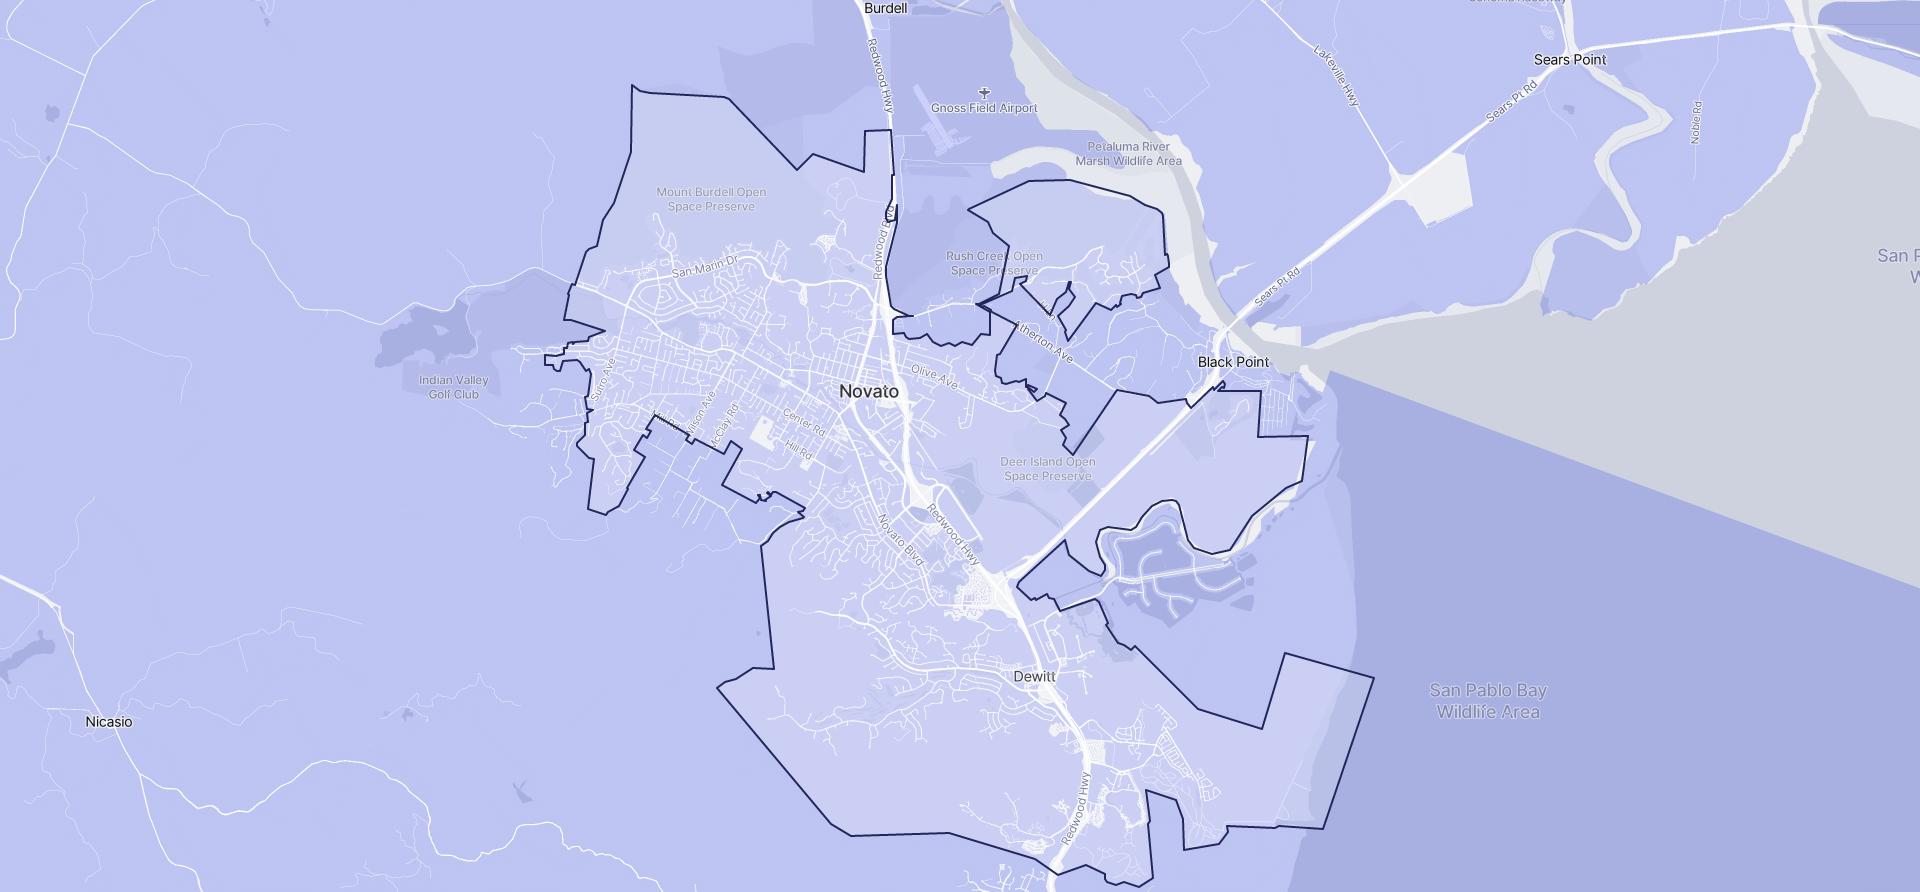 Image of Novato boundaries on a map.